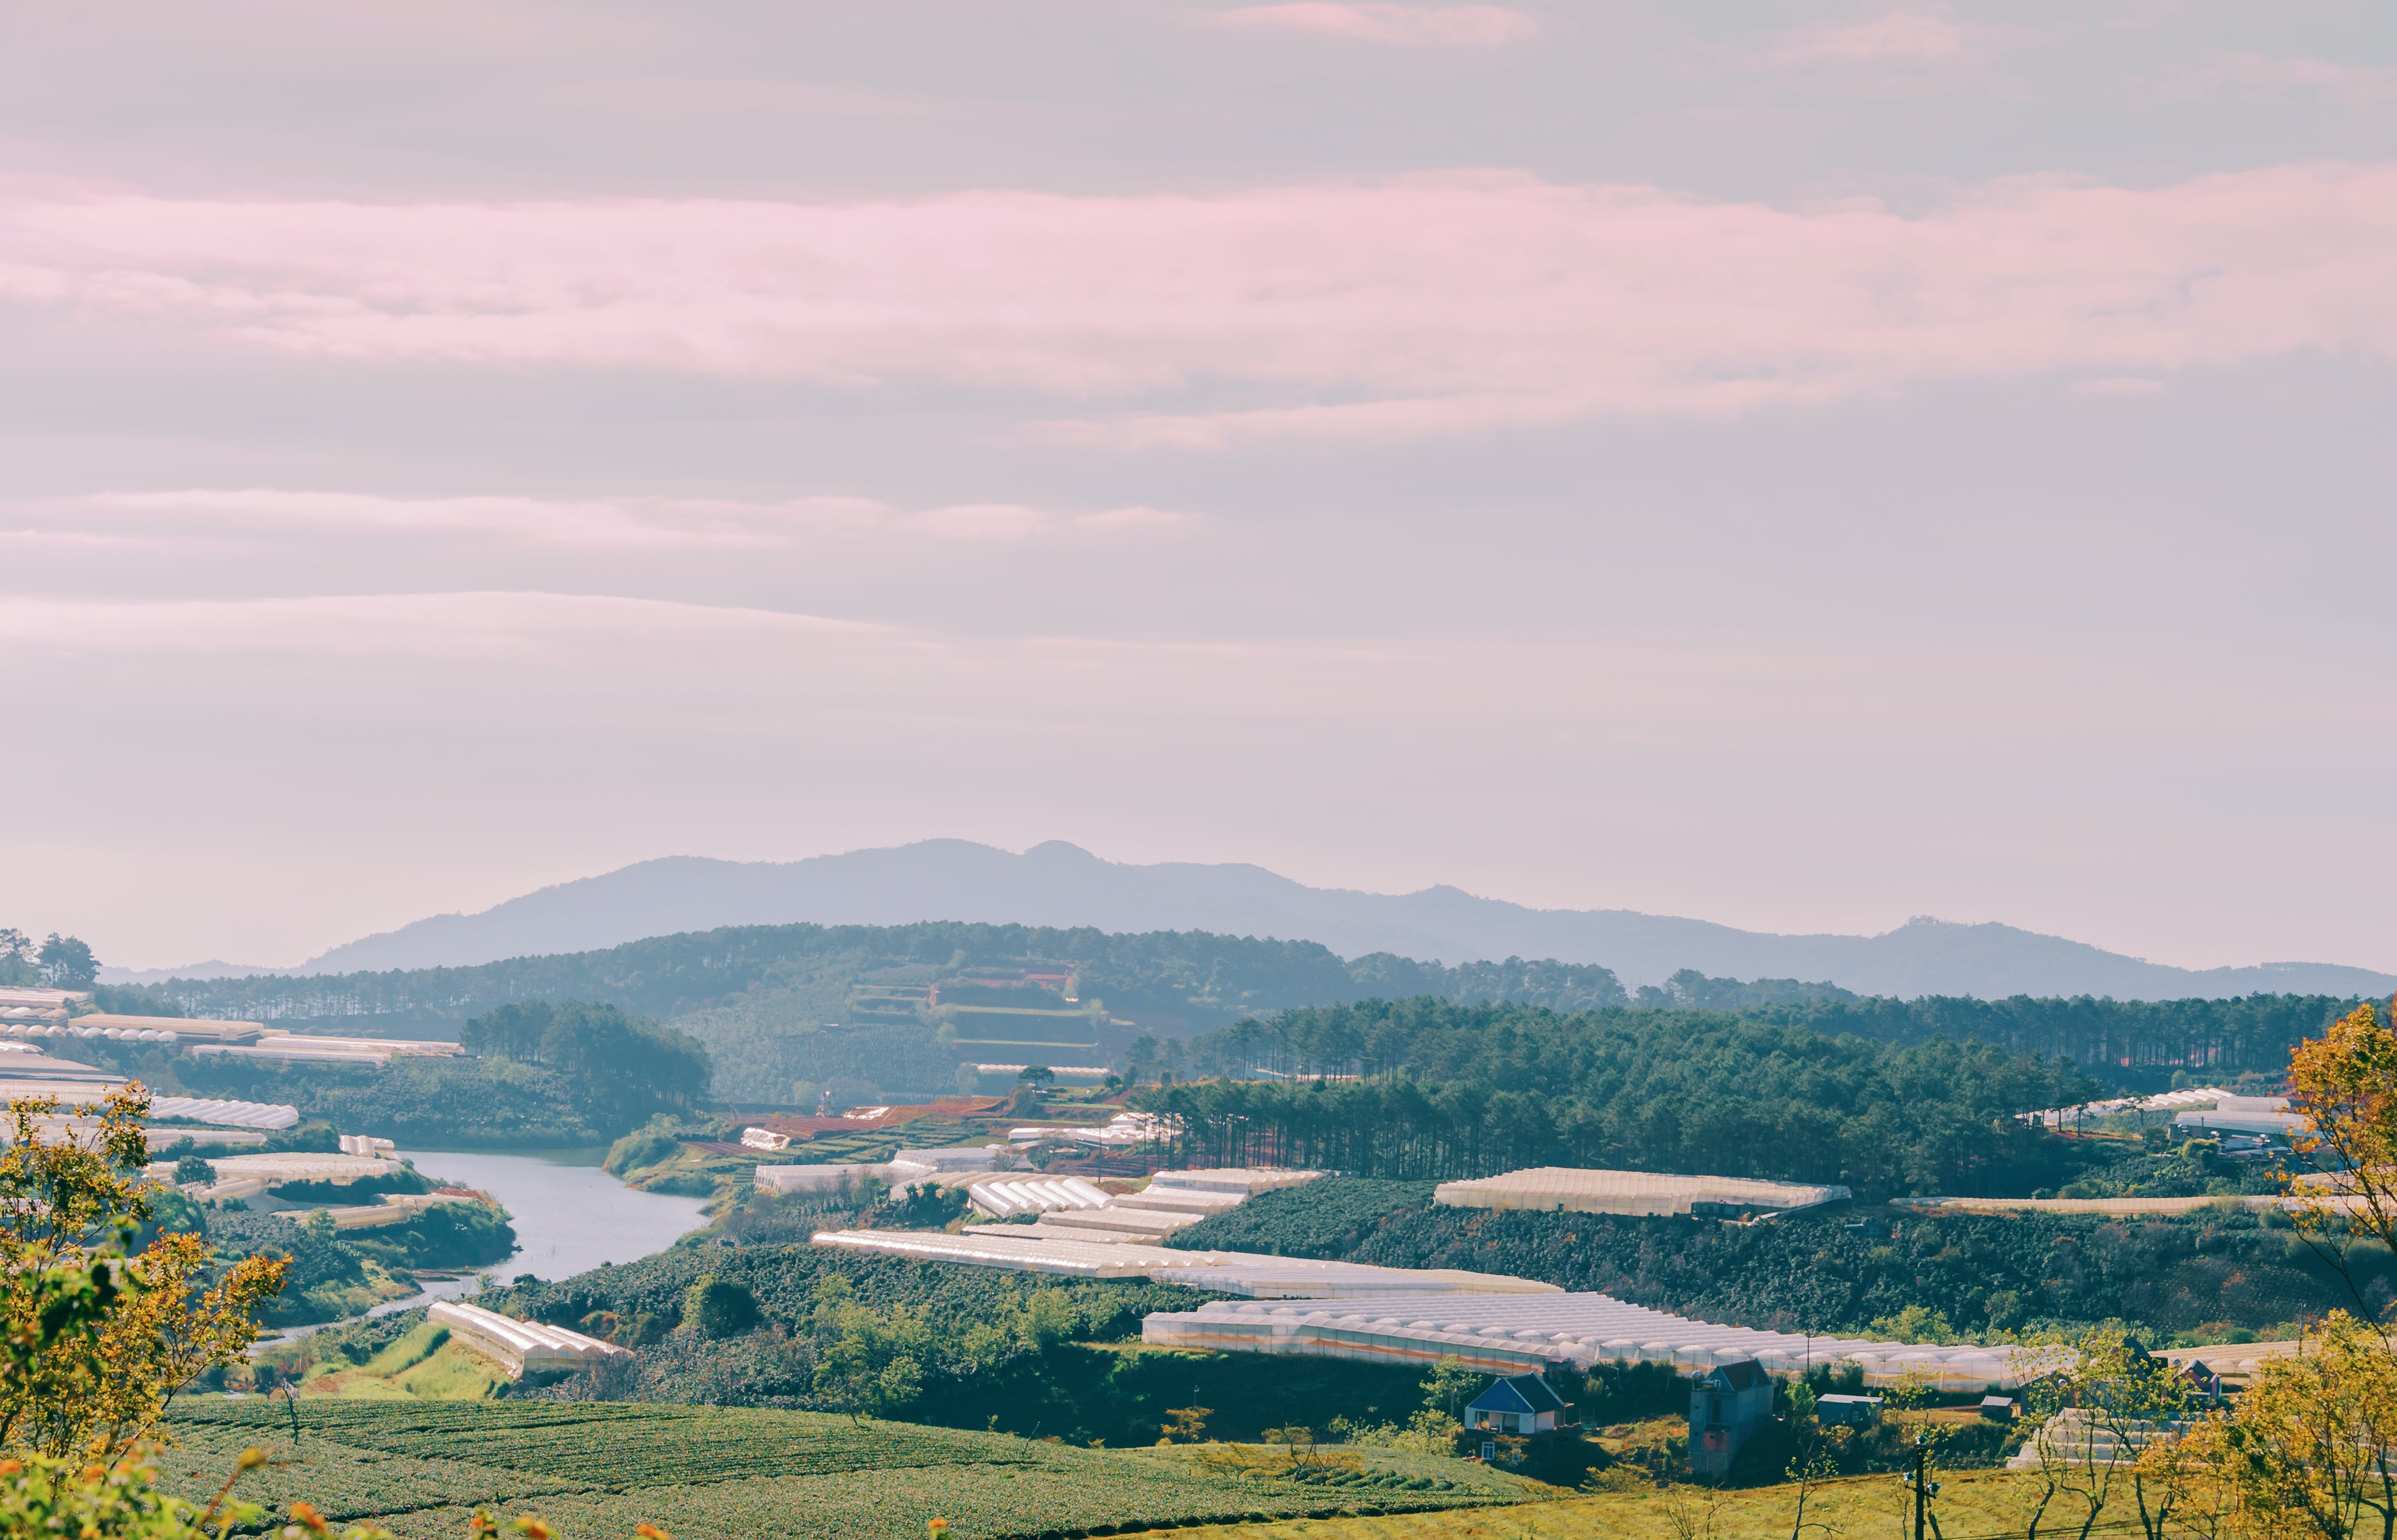 Kostenloses Stock Foto zu acker, ackerland, bäume, berg